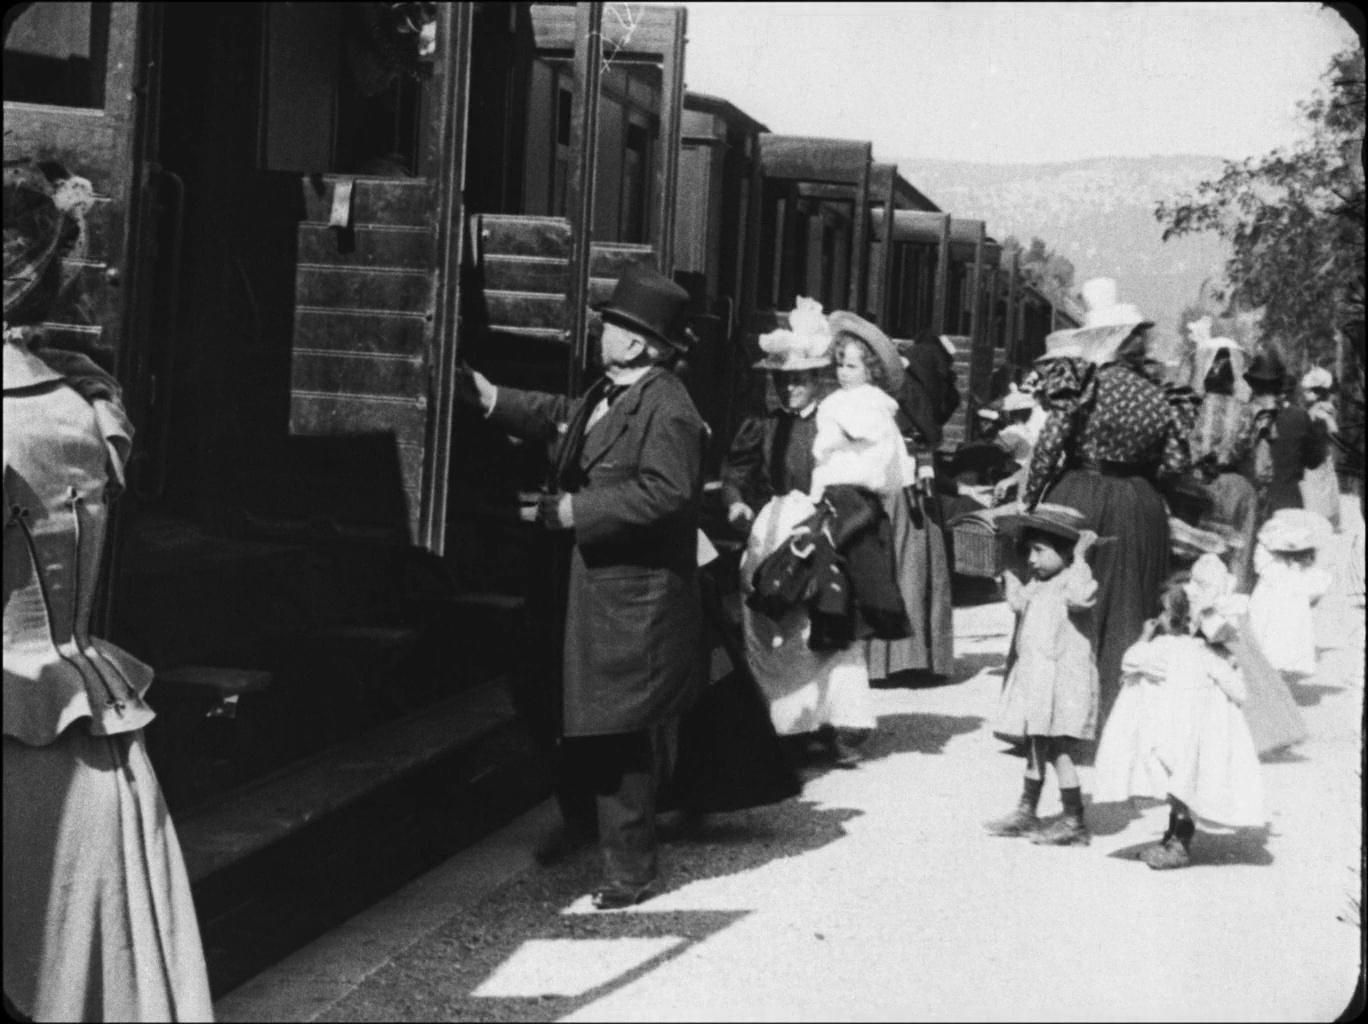 Galerie L'arrivée d'un train en gare de La Ciotat 3